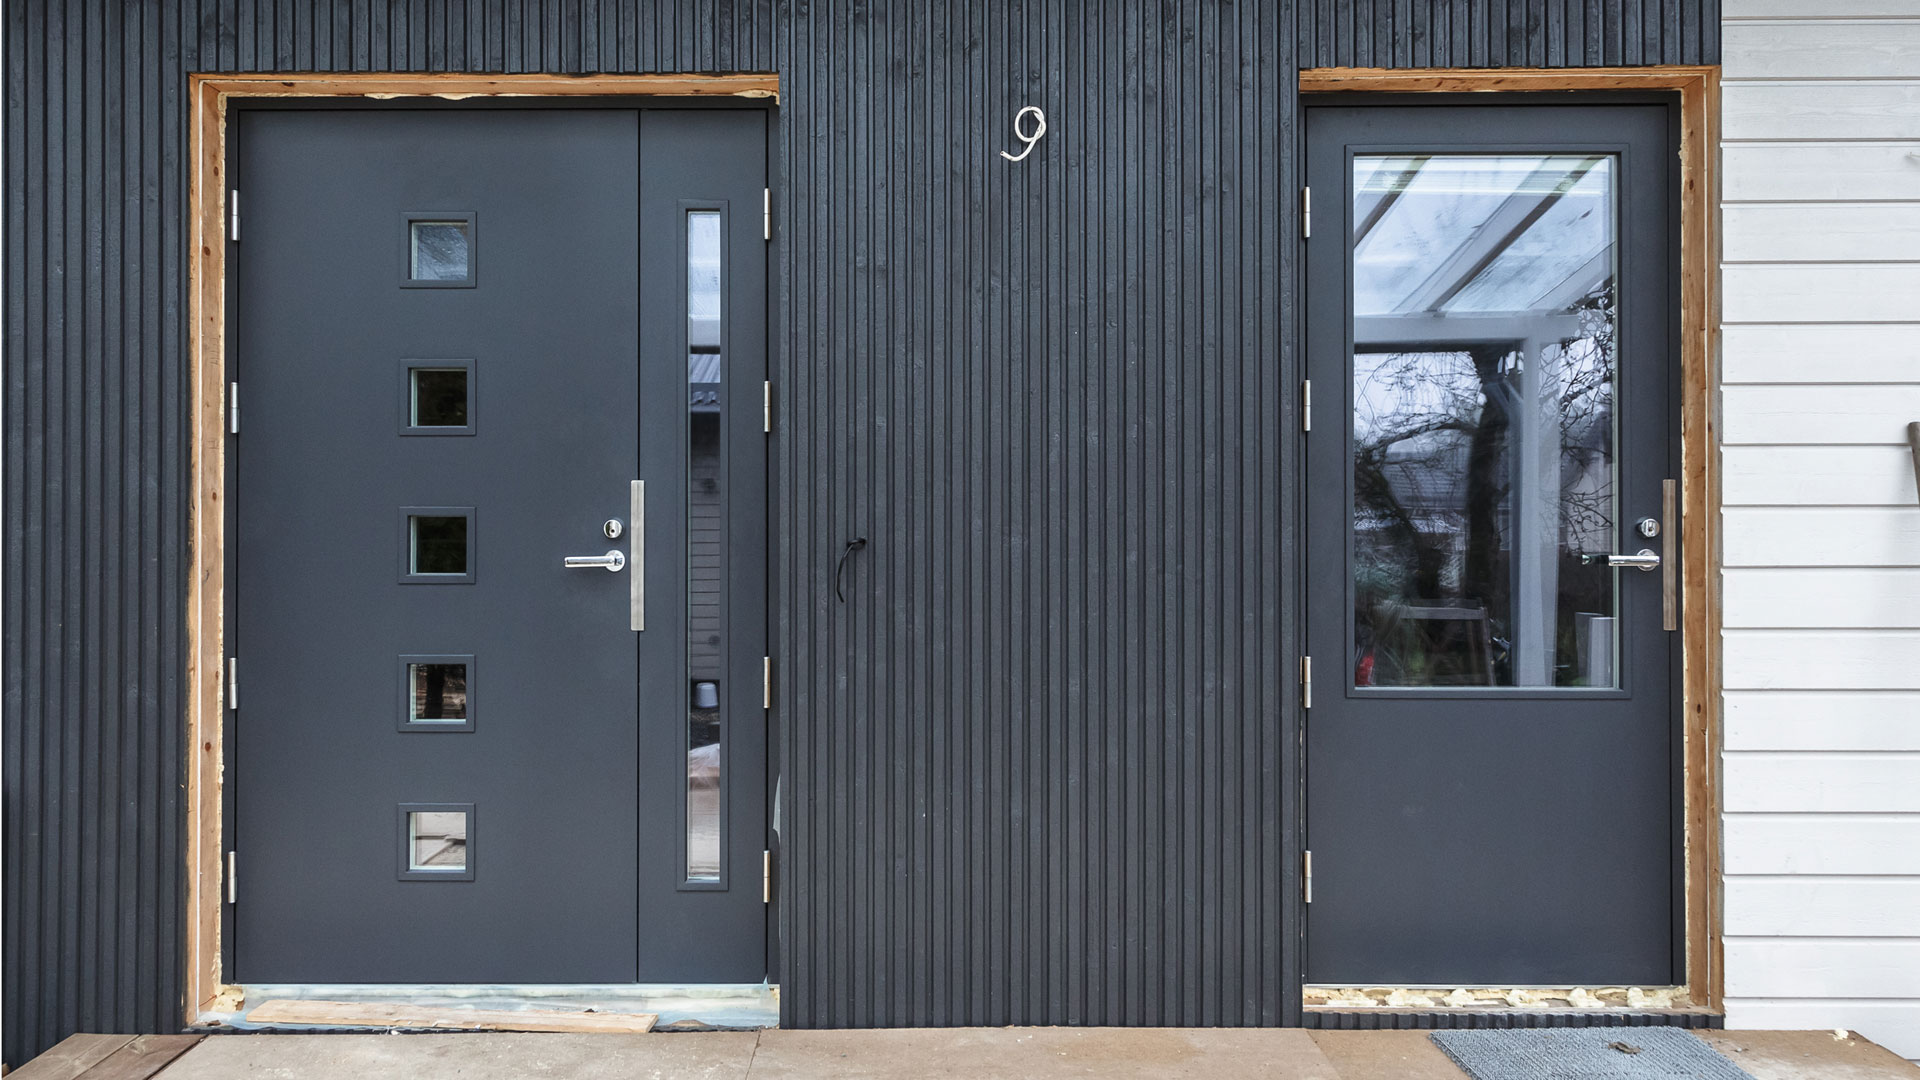 Domus ovet  Perhekoti ilmapiiri